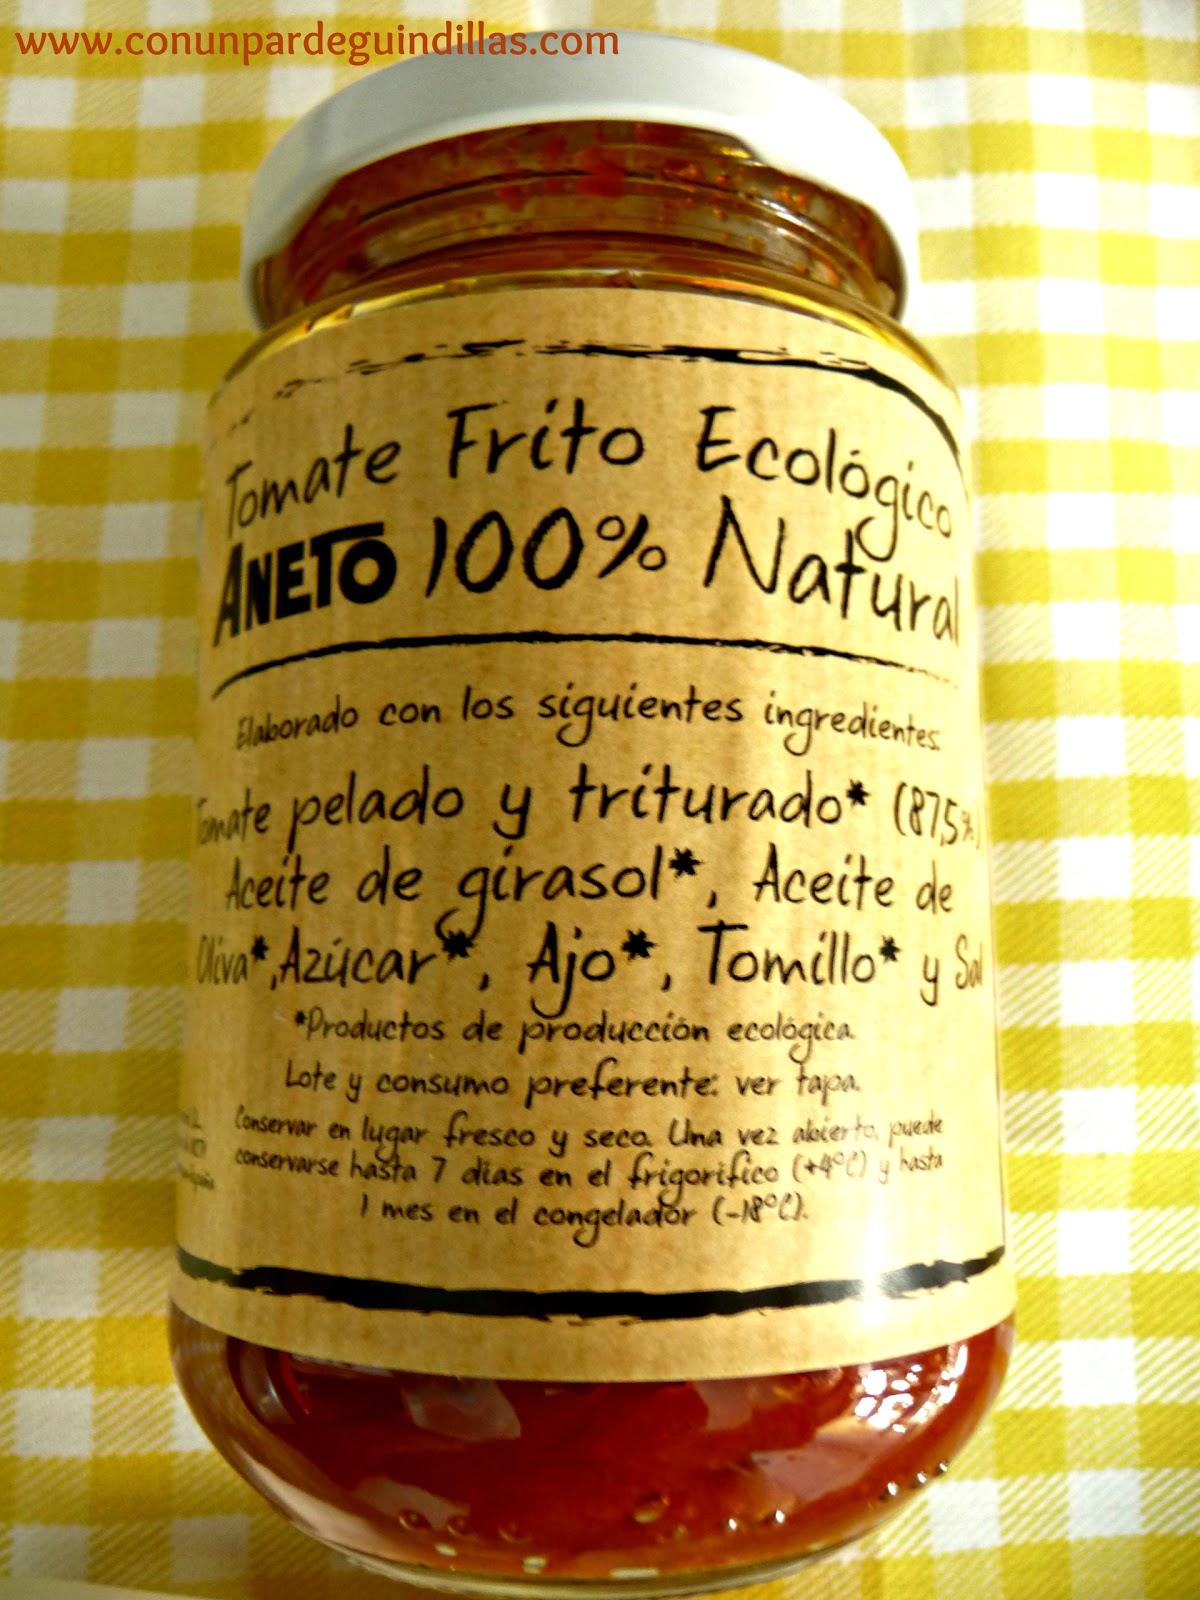 Tomate frito ecológico Aneto 100% Natural